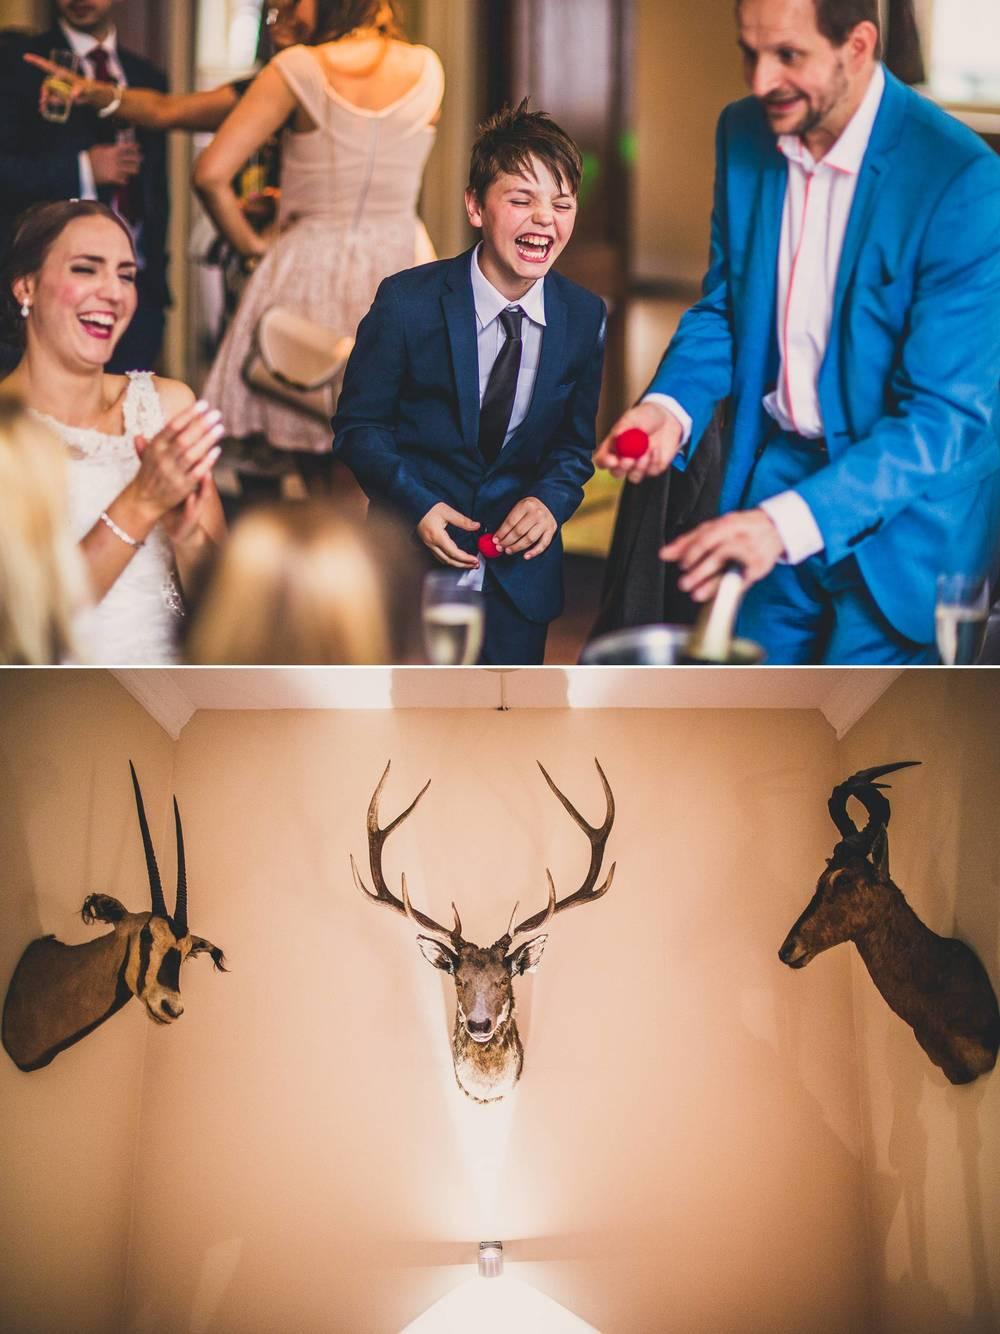 liverpool-wedding-photographer- 17.jpg